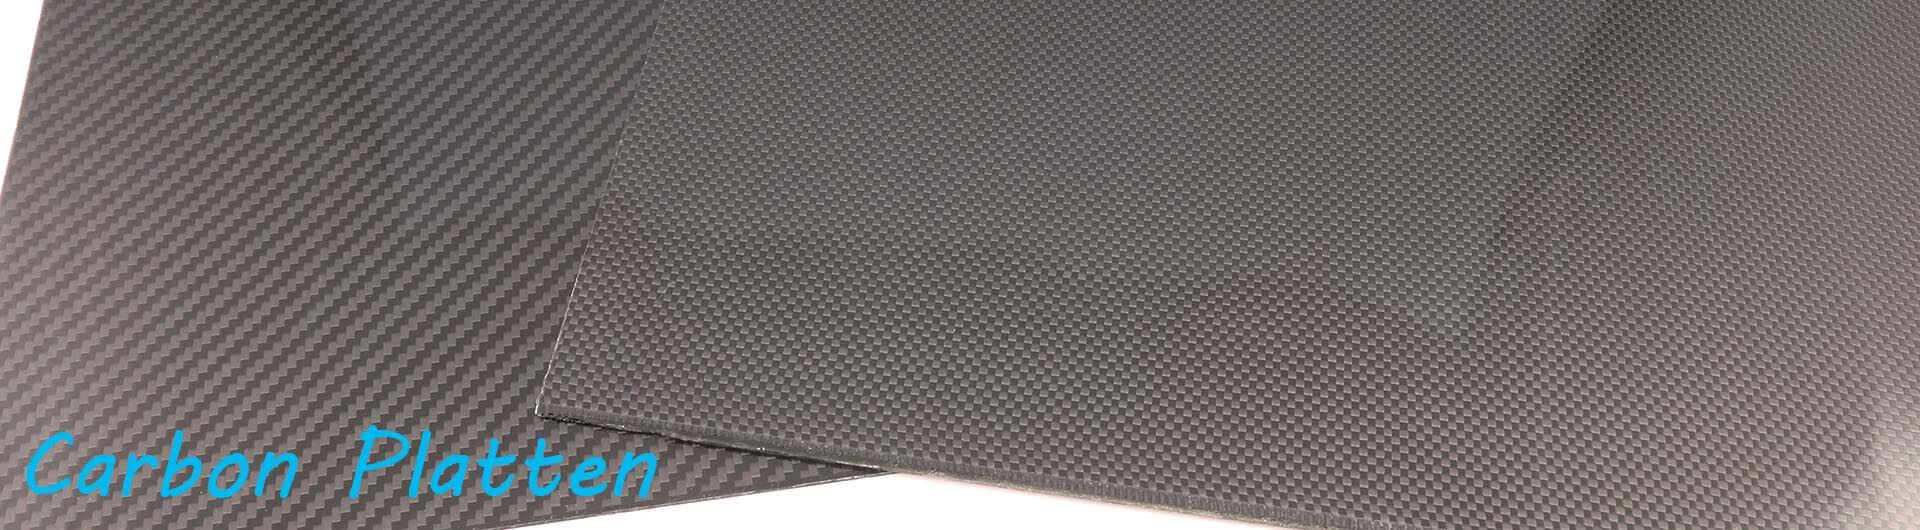 Carbon Aluminium 7075 CNC milling Datron